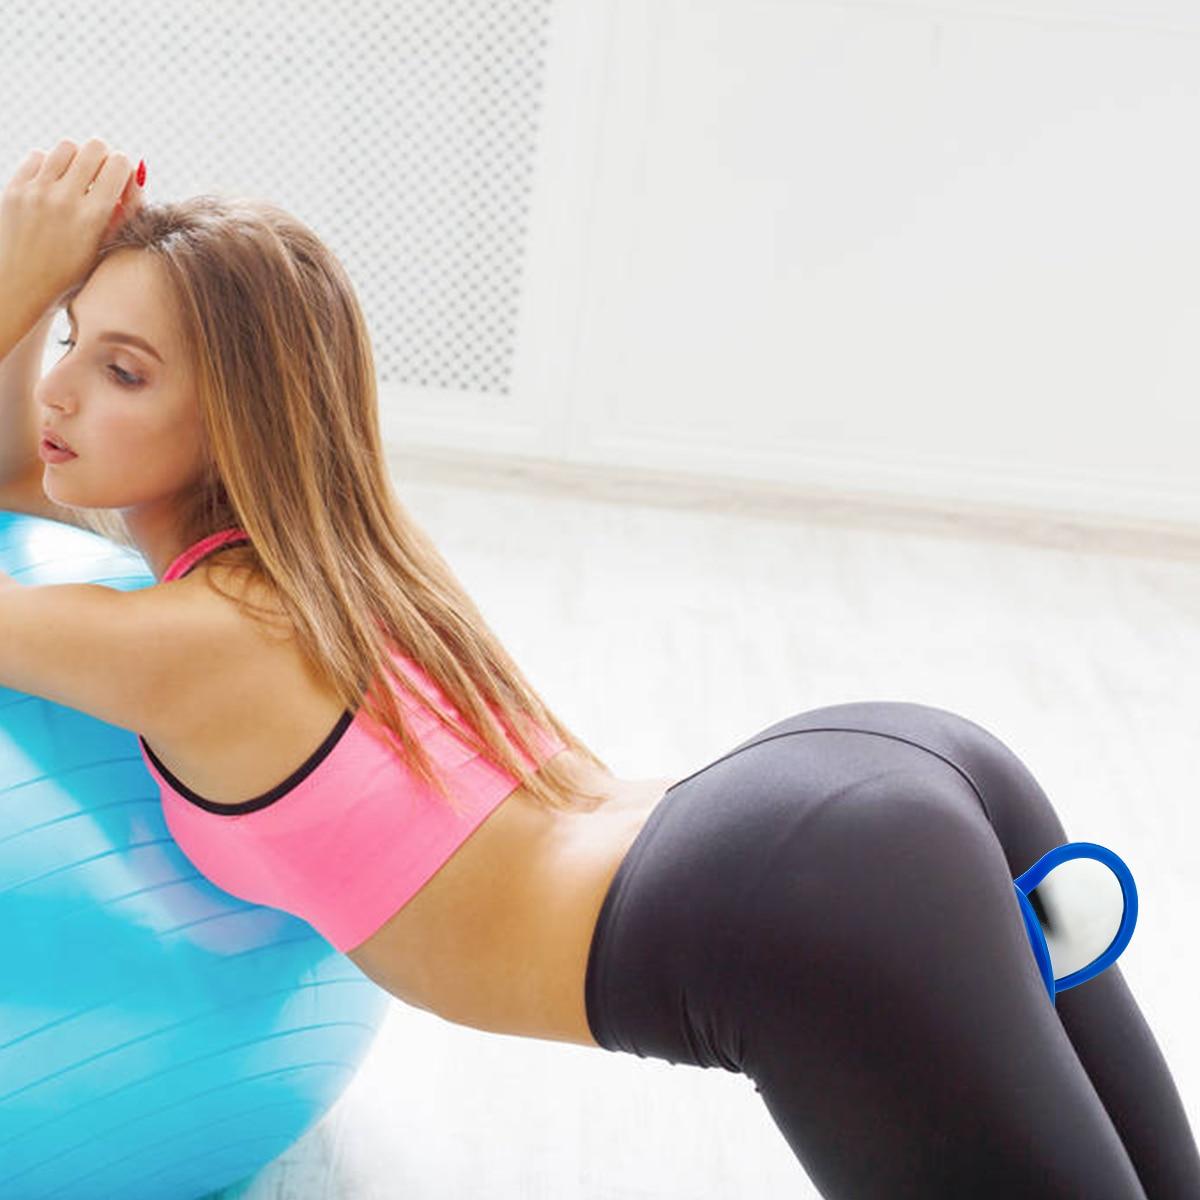 Pelgrip Pelvis Home Training Fitness Equipment Pelvic Helps Reduce Pelvis Postpartum Recovery Floor Muscle Thigh Hip Trainer